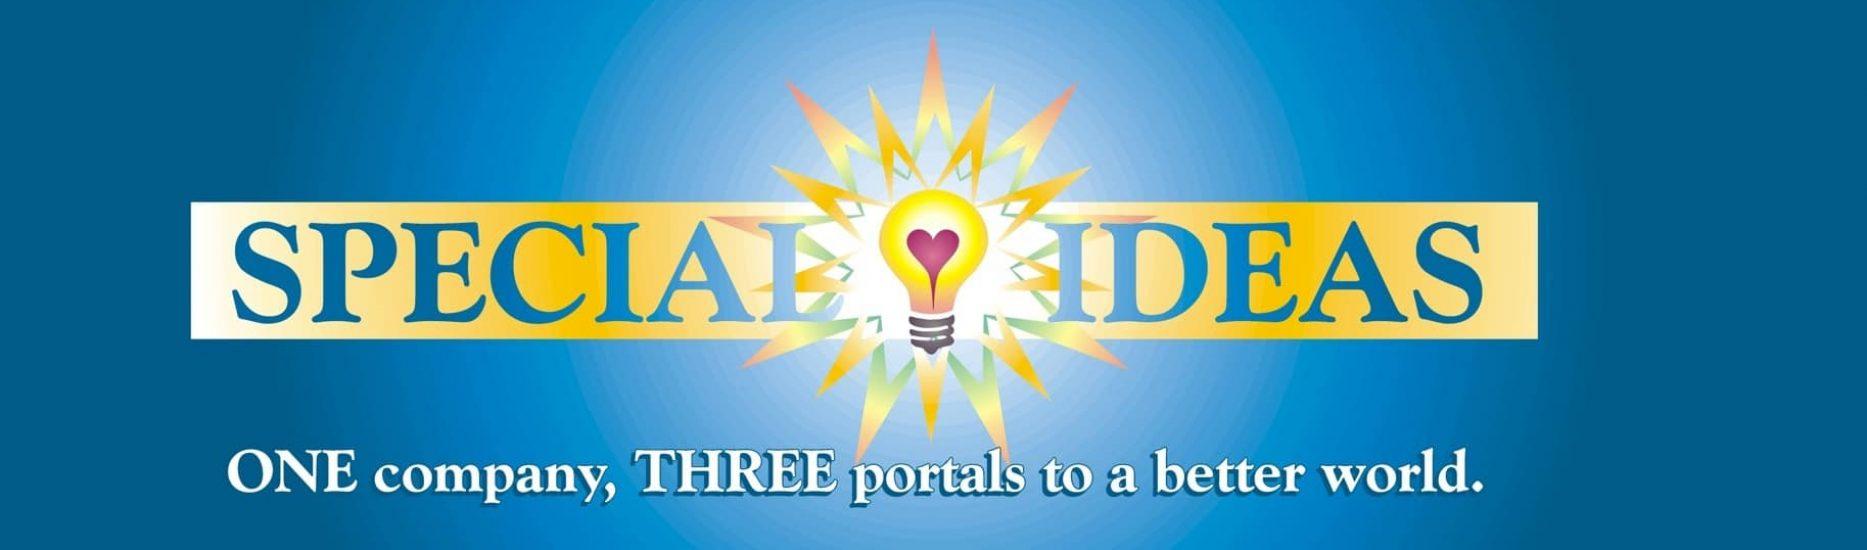 Special-IdeasWebsiteHeadersized